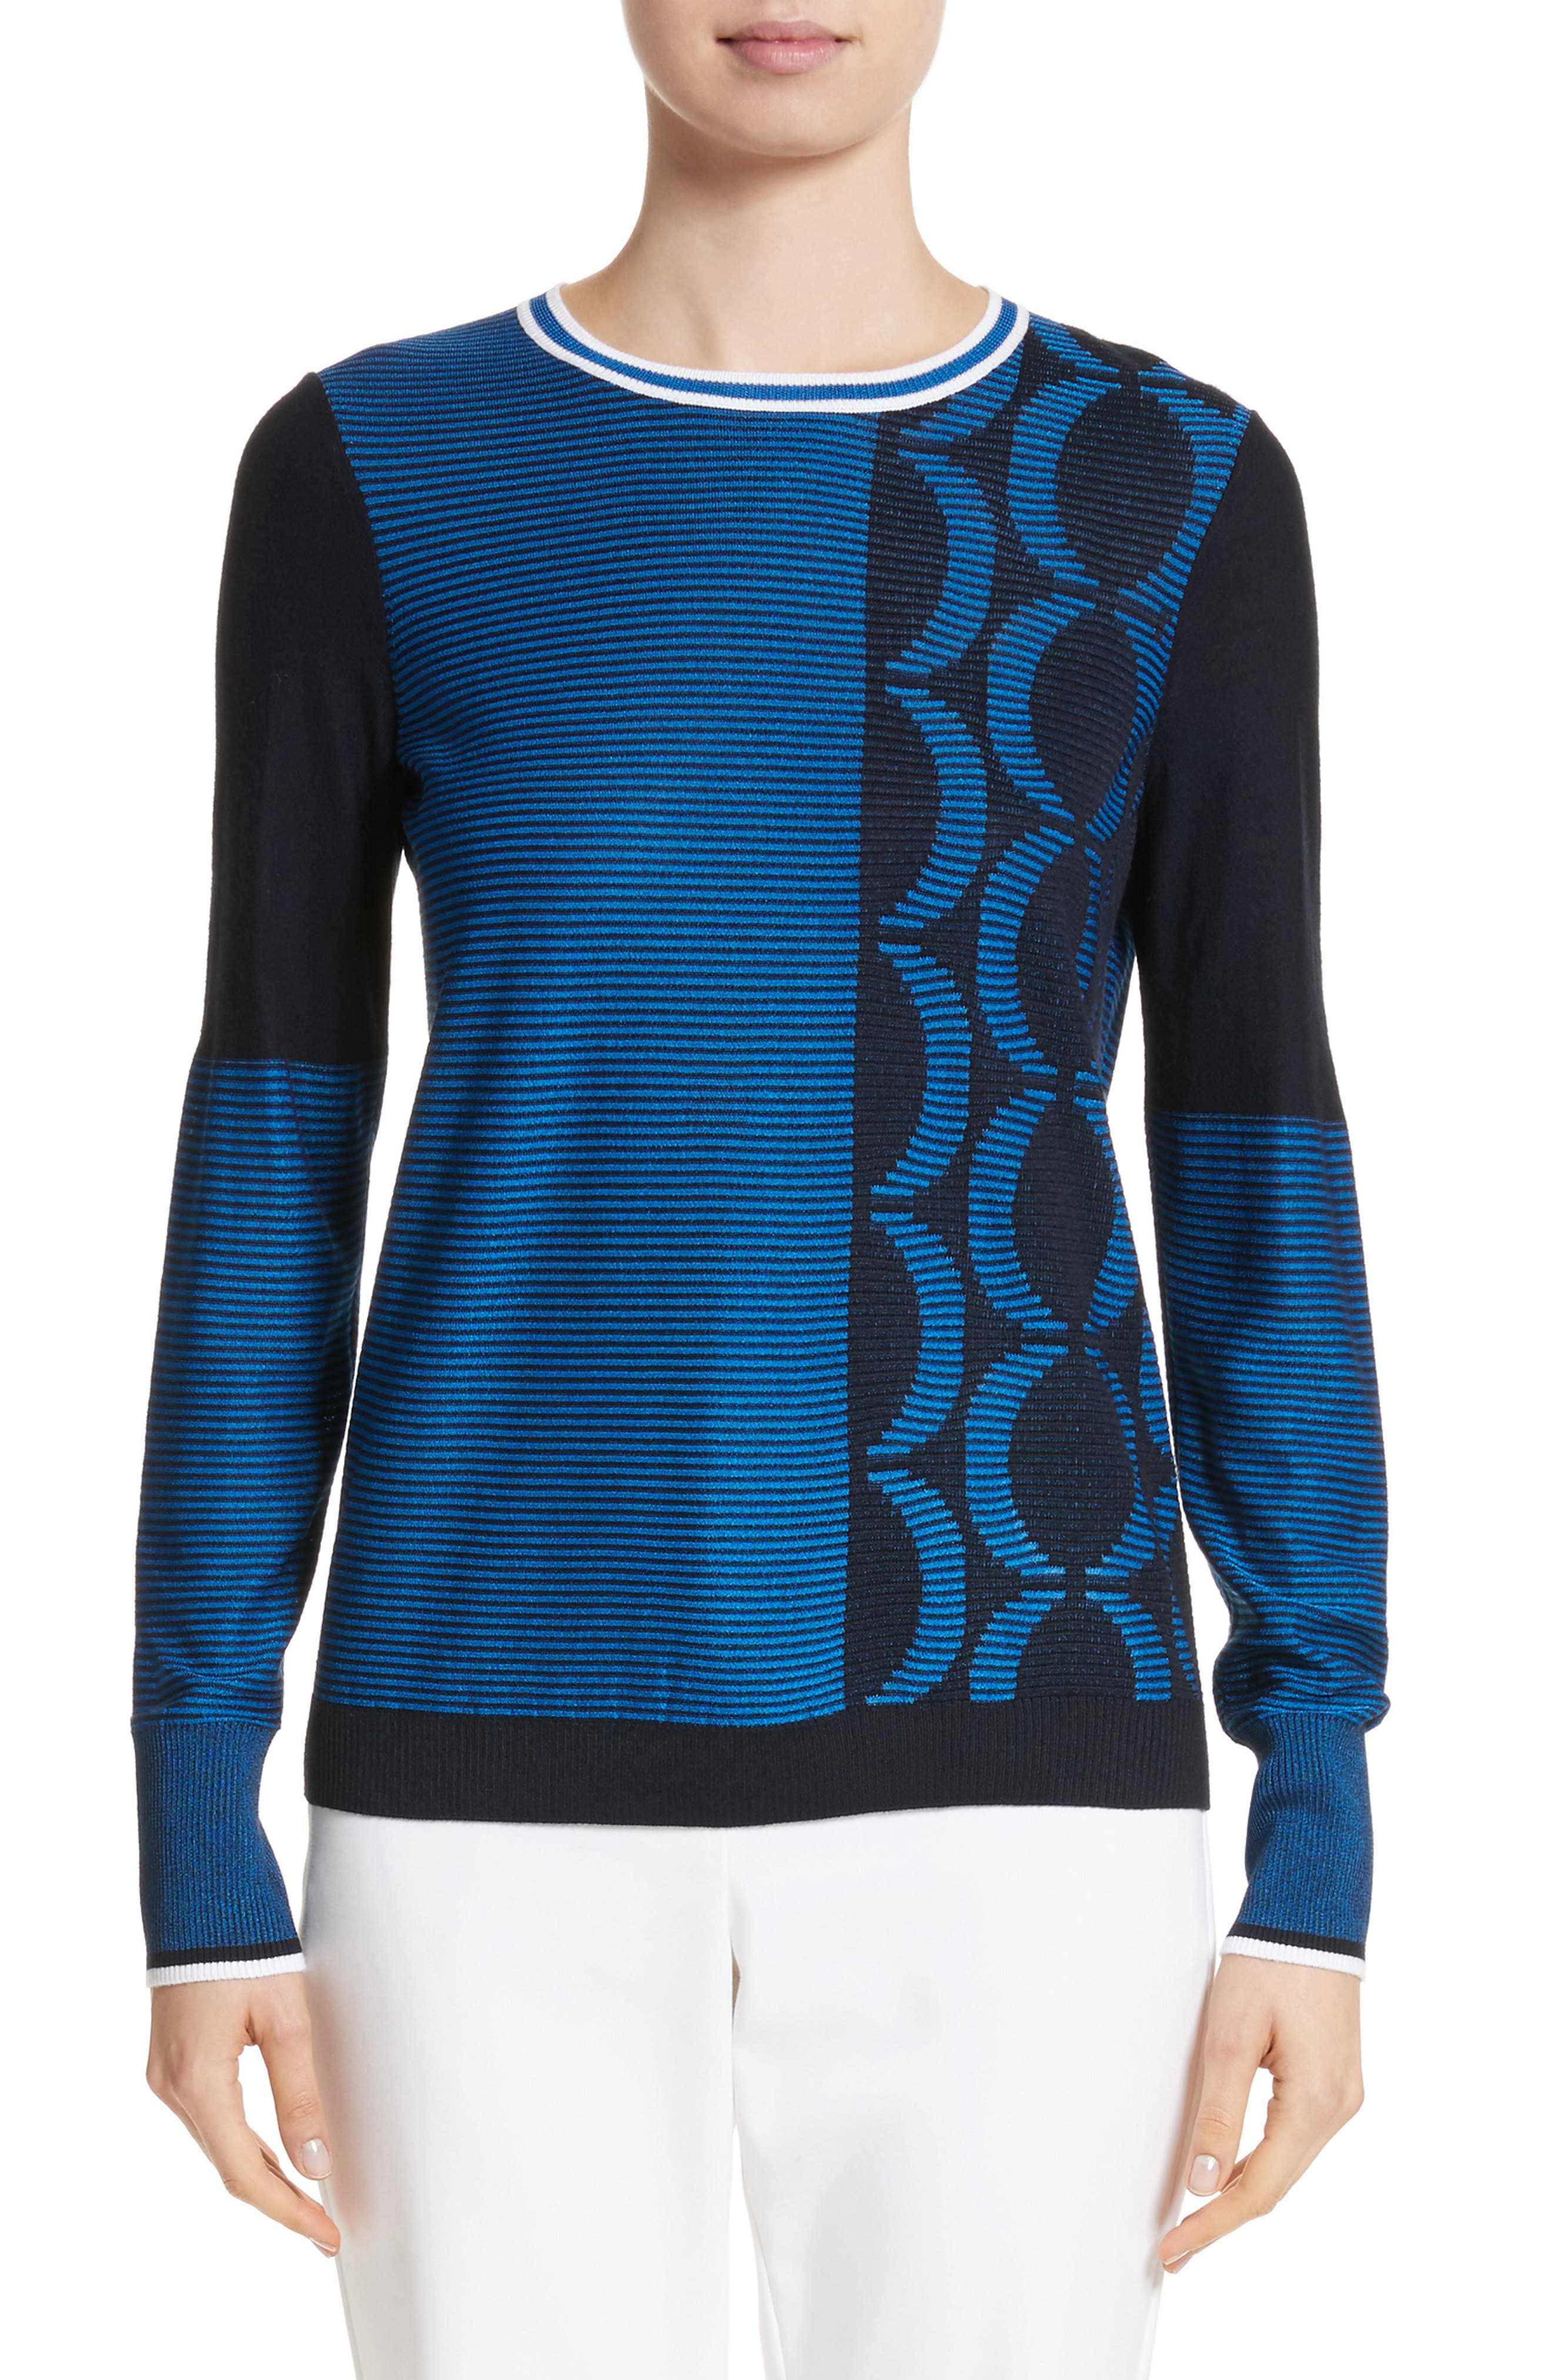 Main Image - St. John Collection Jacquard Knit Sweater